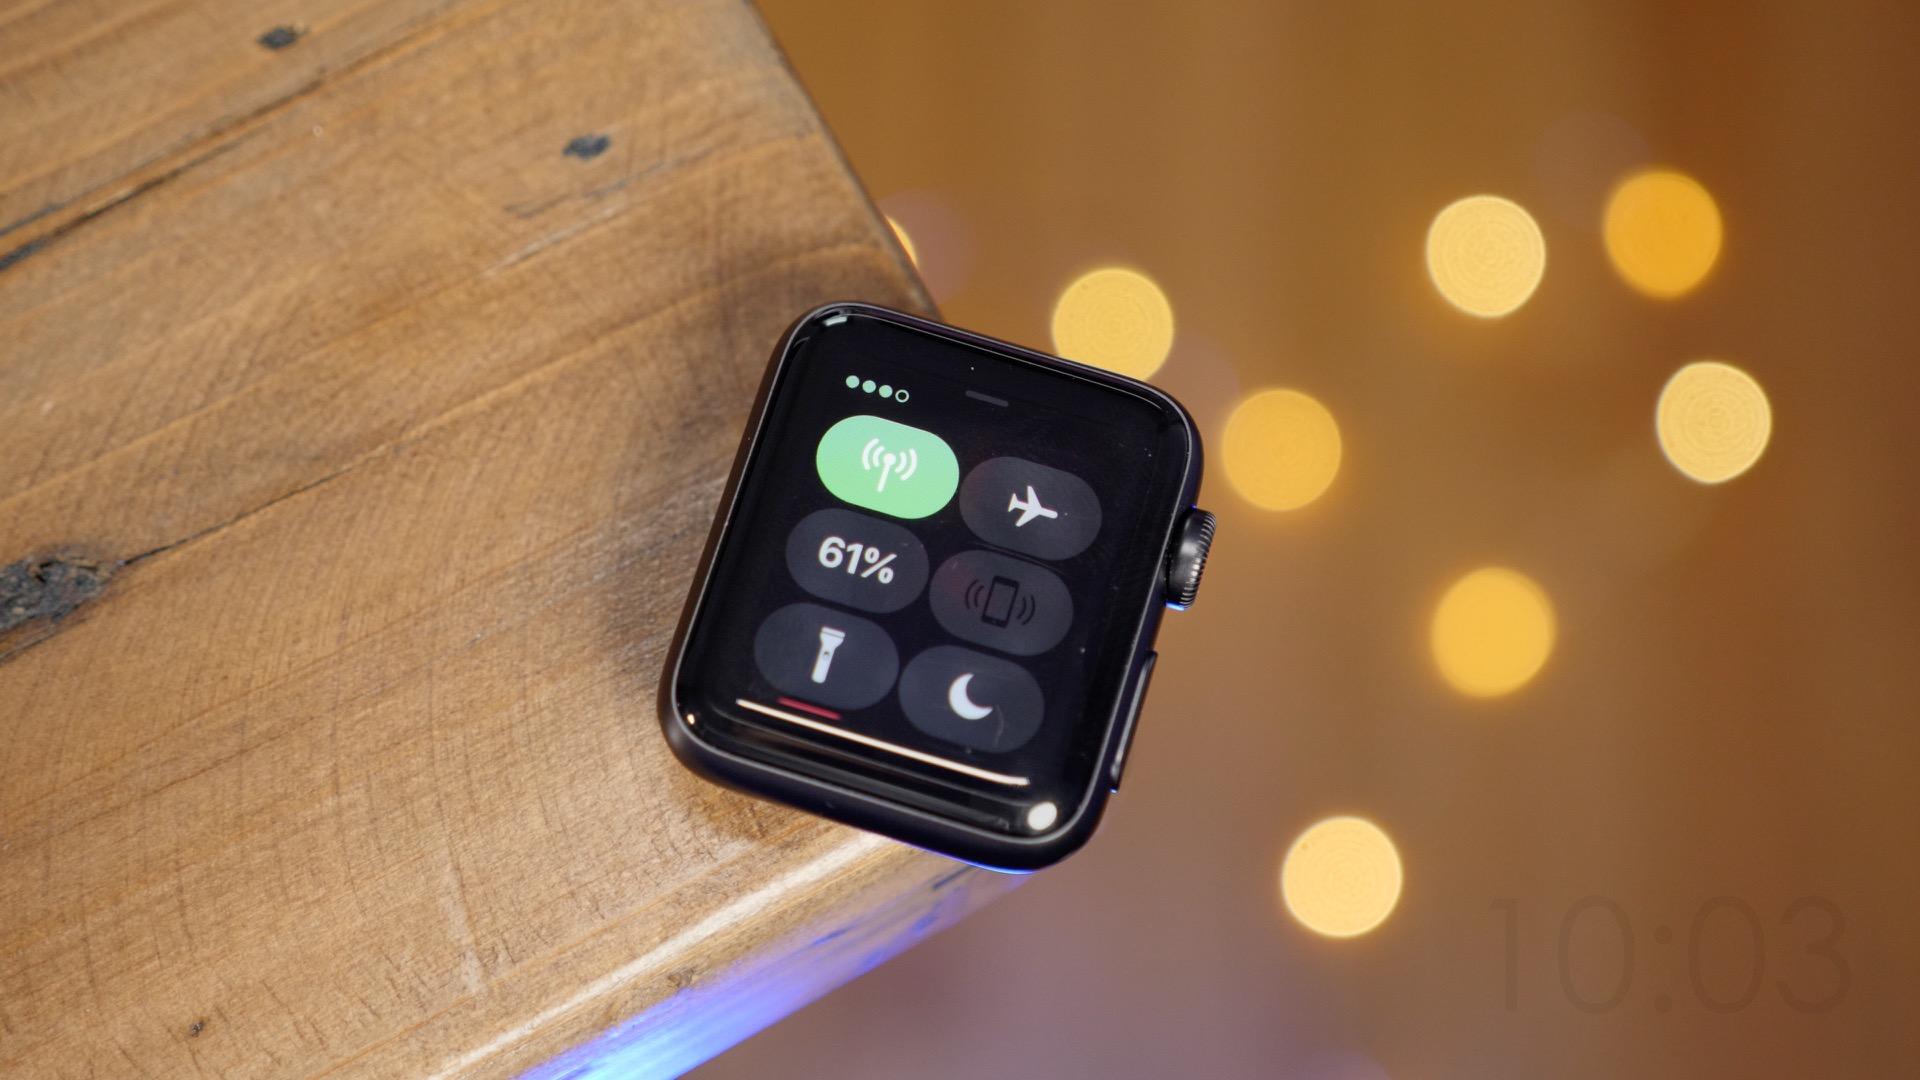 Sleep++ 3 for Apple Watch adds automatic sleep tracking, morning sleep summary, more